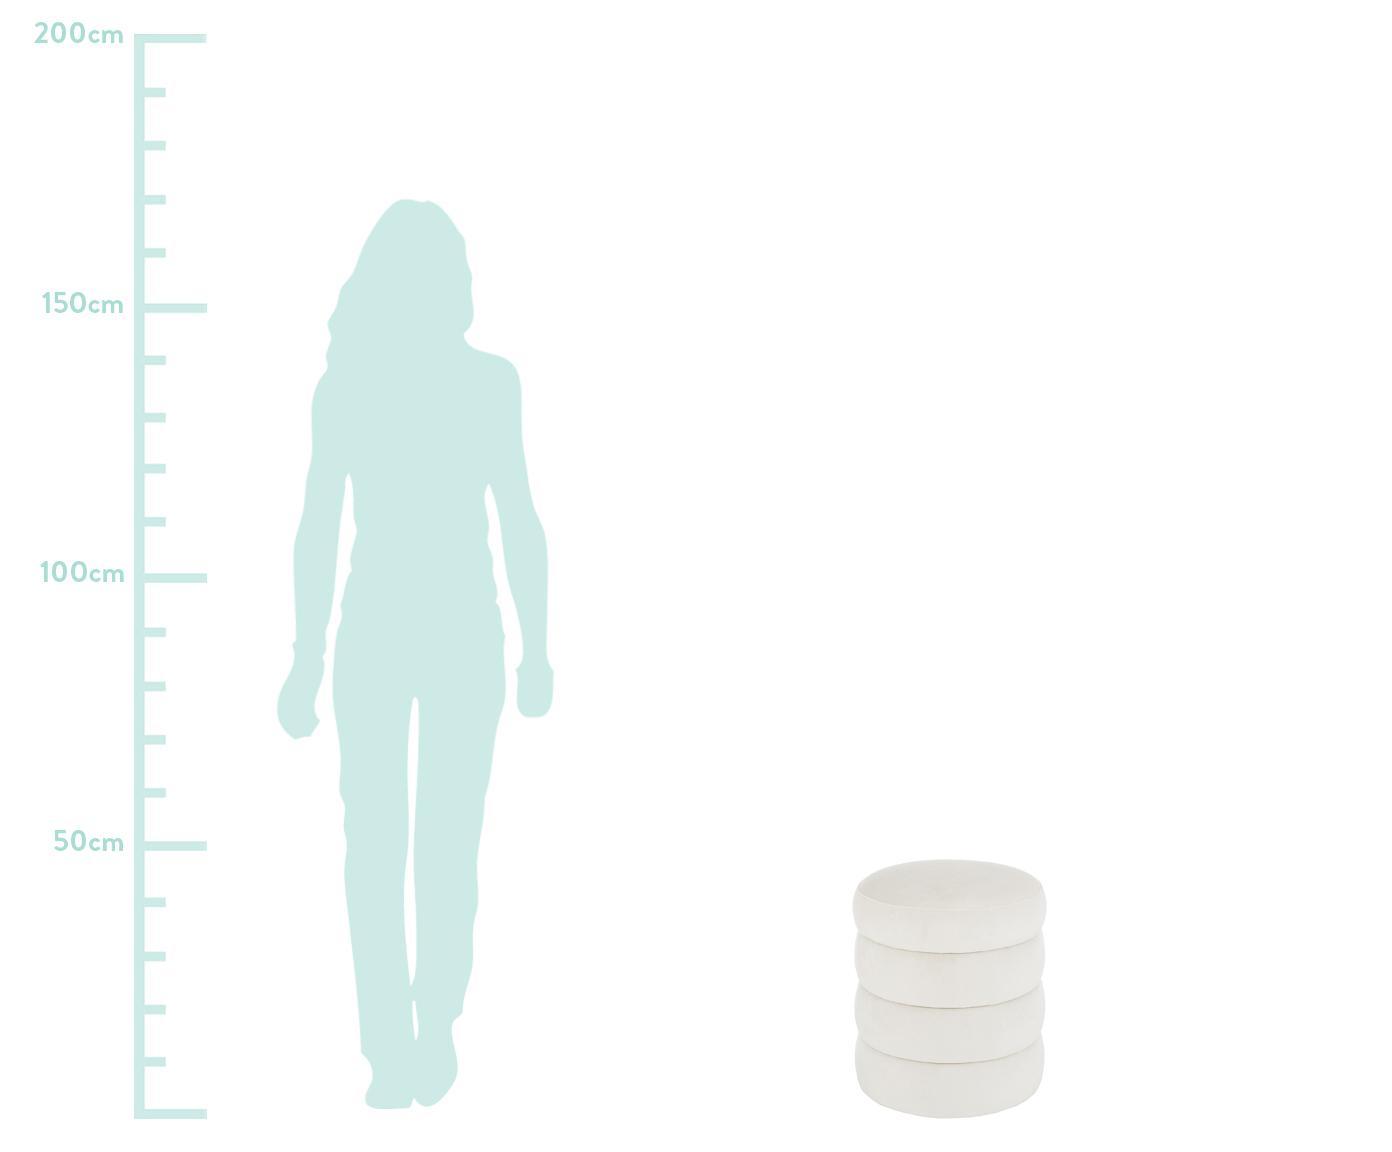 Samt-Hocker Alto, Bezug: Samt (Polyester) Der hoch, Gestell: Massives Kiefernholz, Spe, Samt Cremeweiß, Ø 42 x H 47 cm